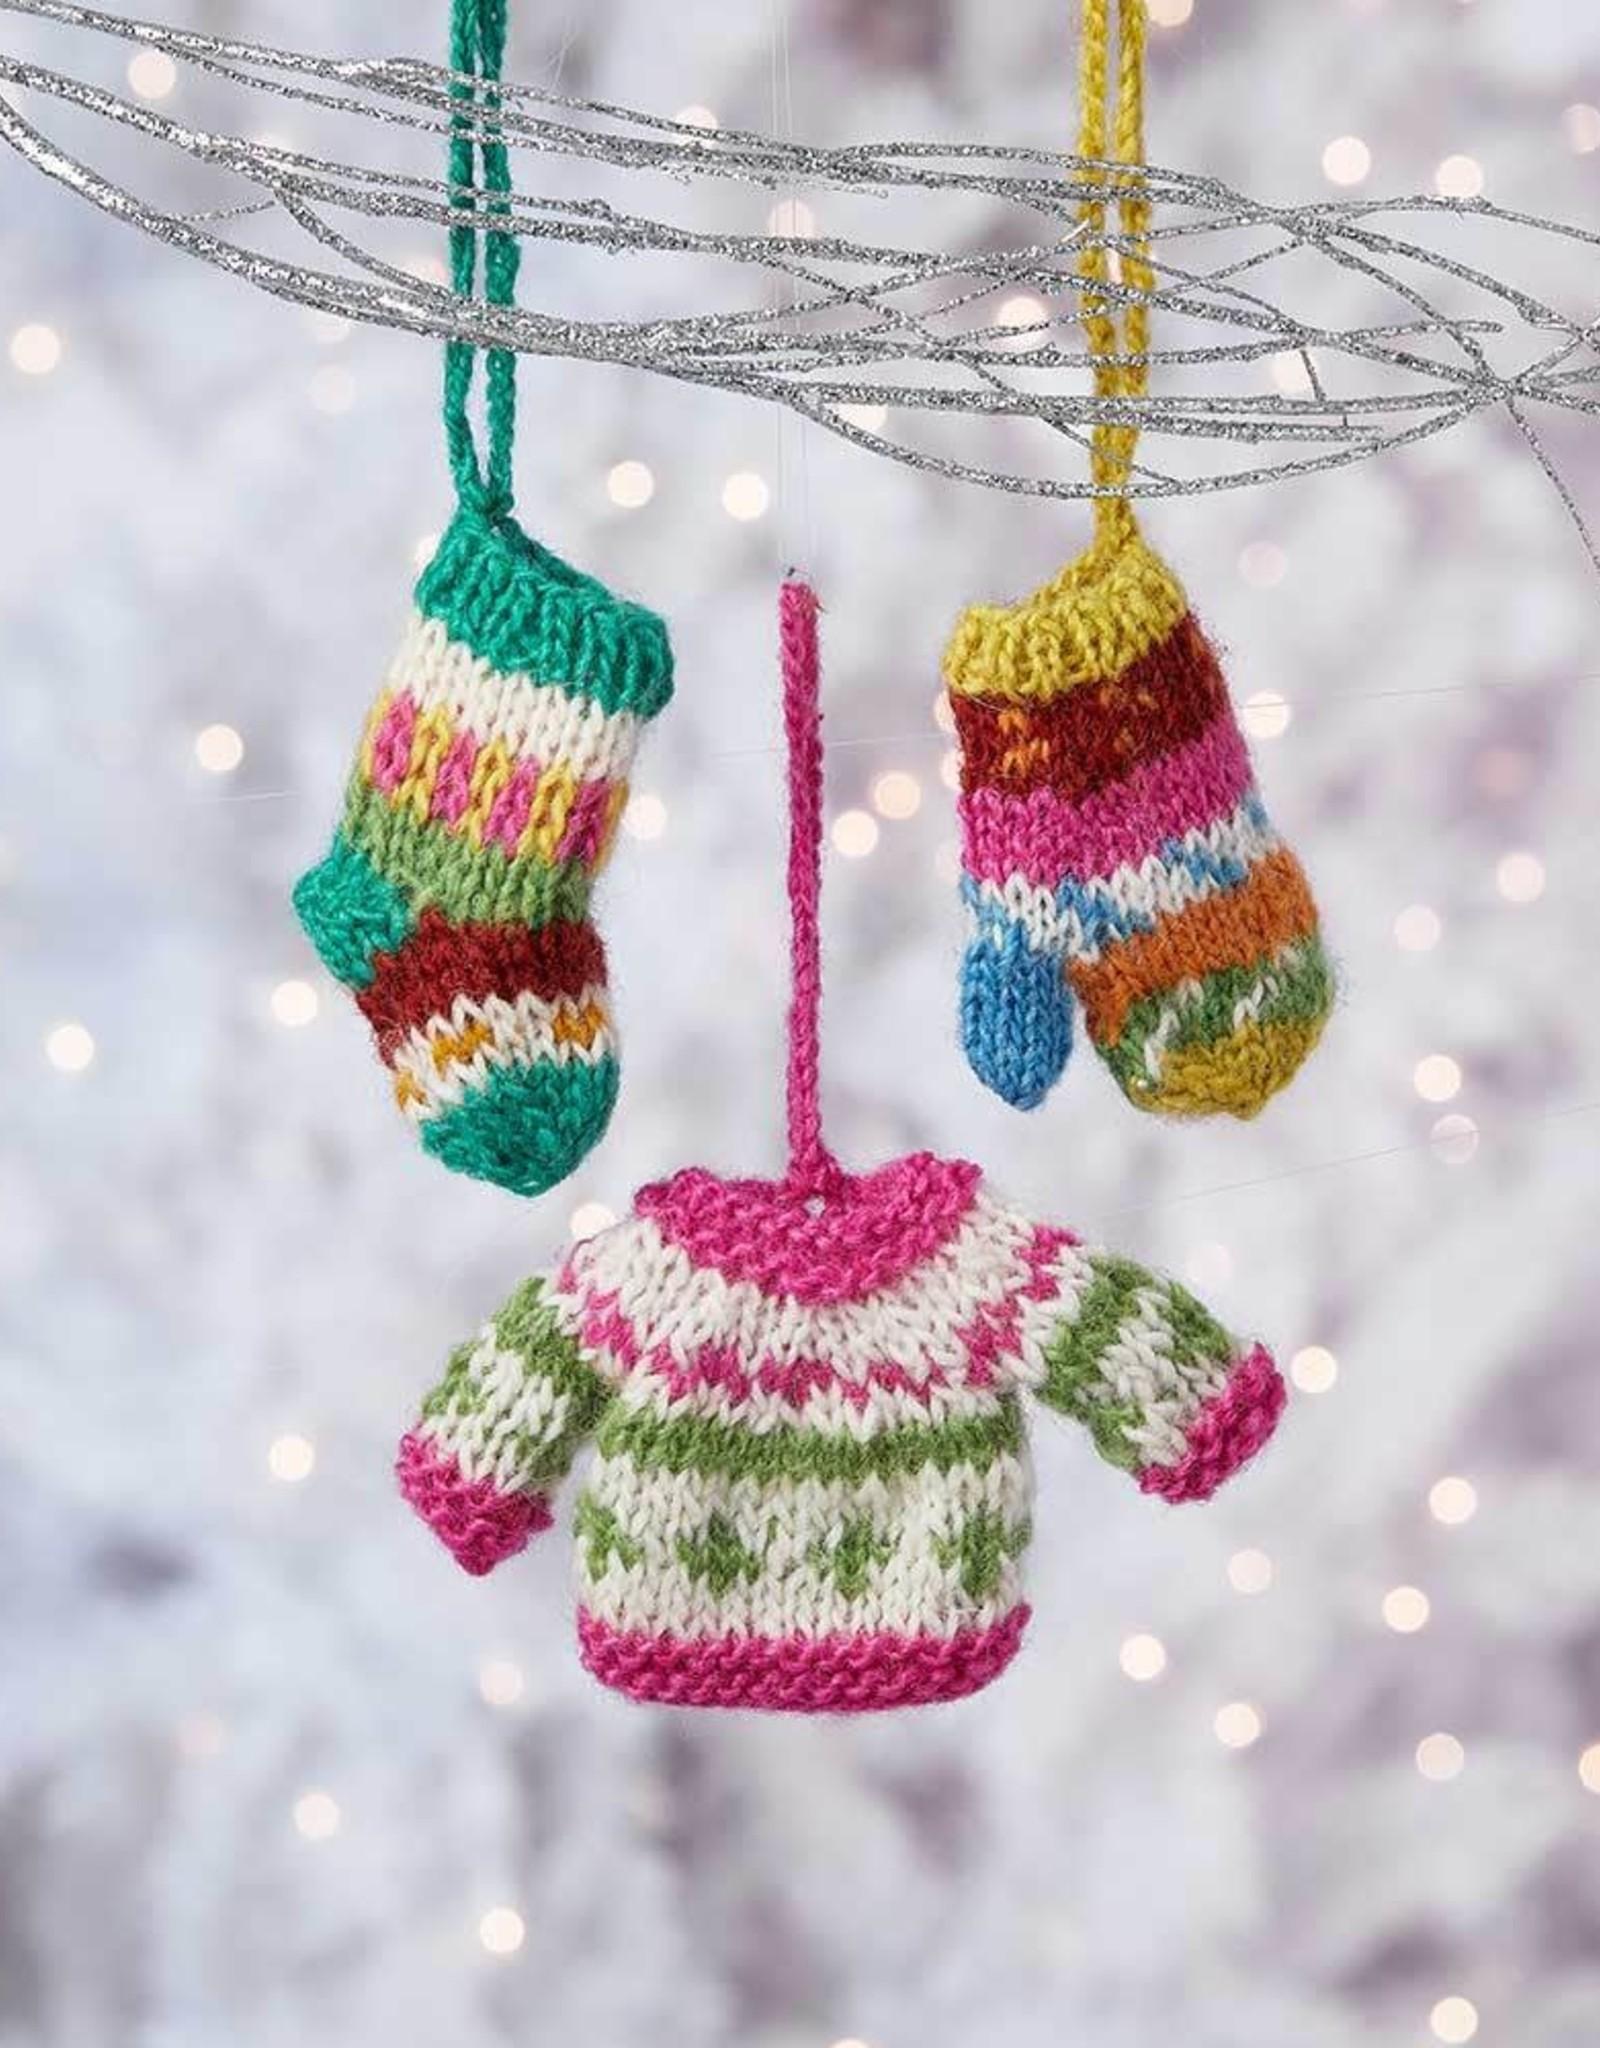 Serrv All Bundled Up Ornament